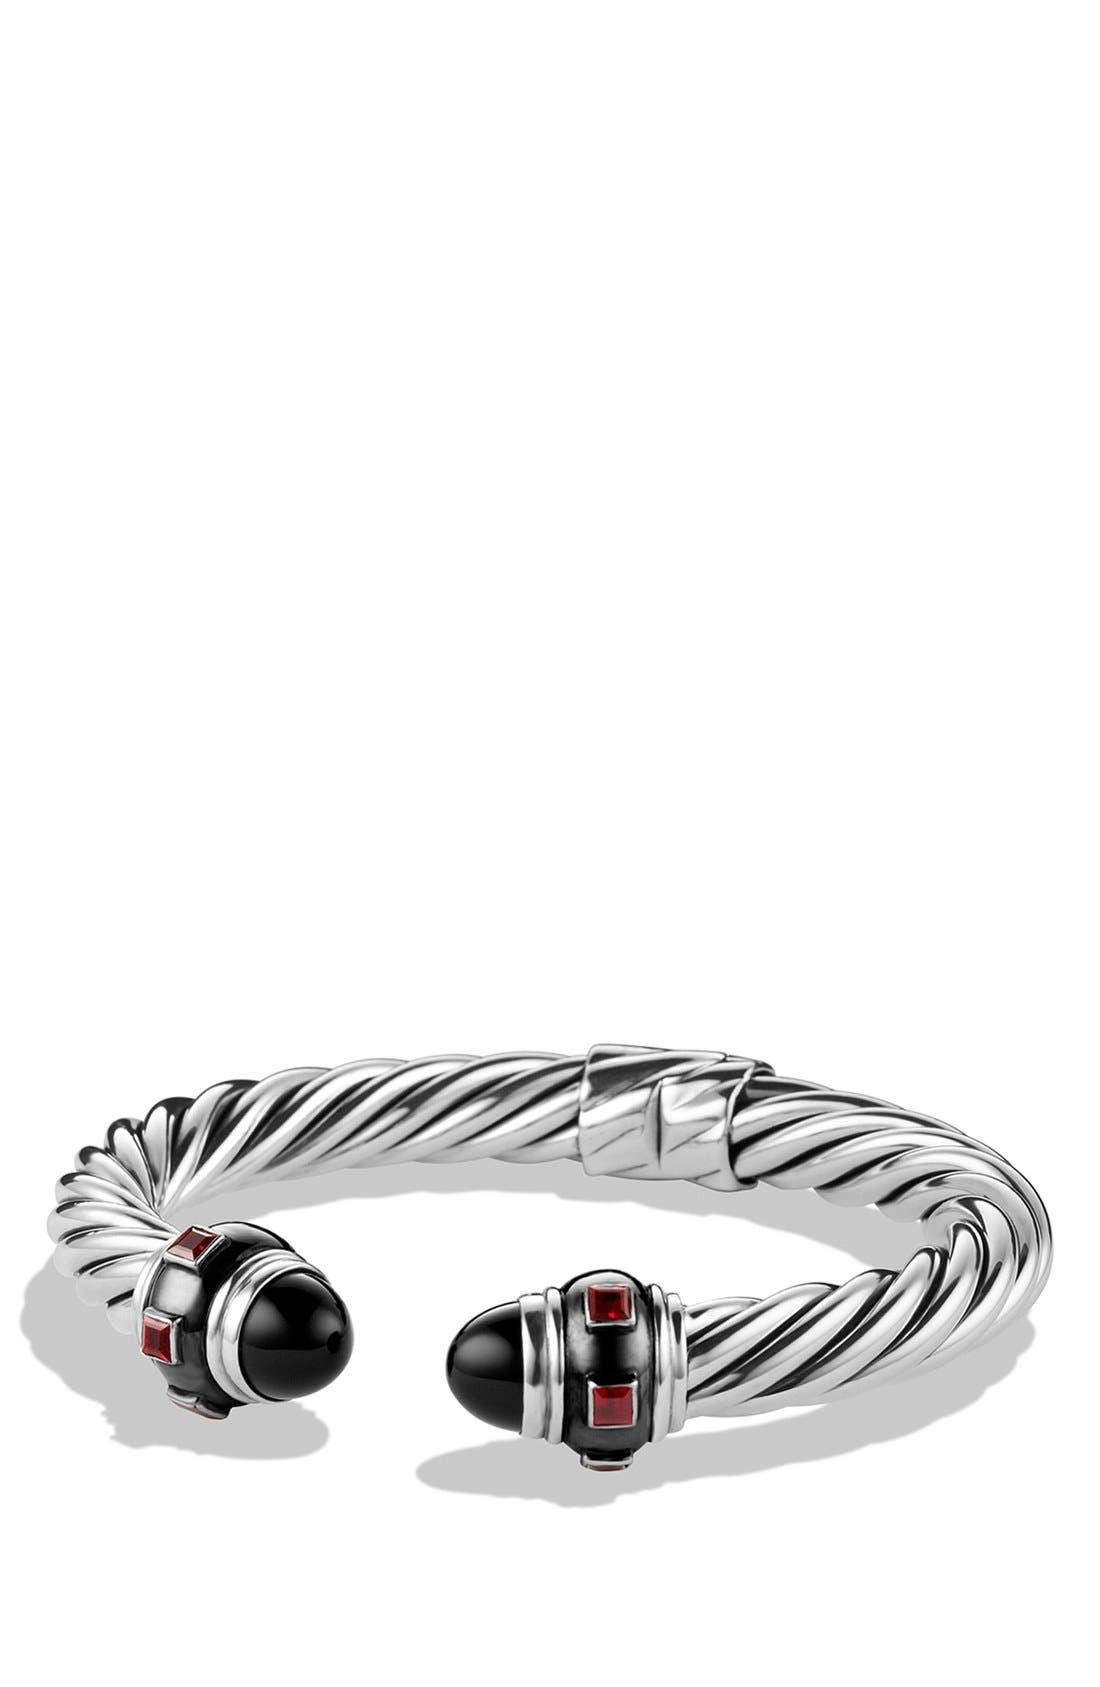 Main Image - David Yurman 'Renaissance' Bracelet with Black Onyx and Ruby